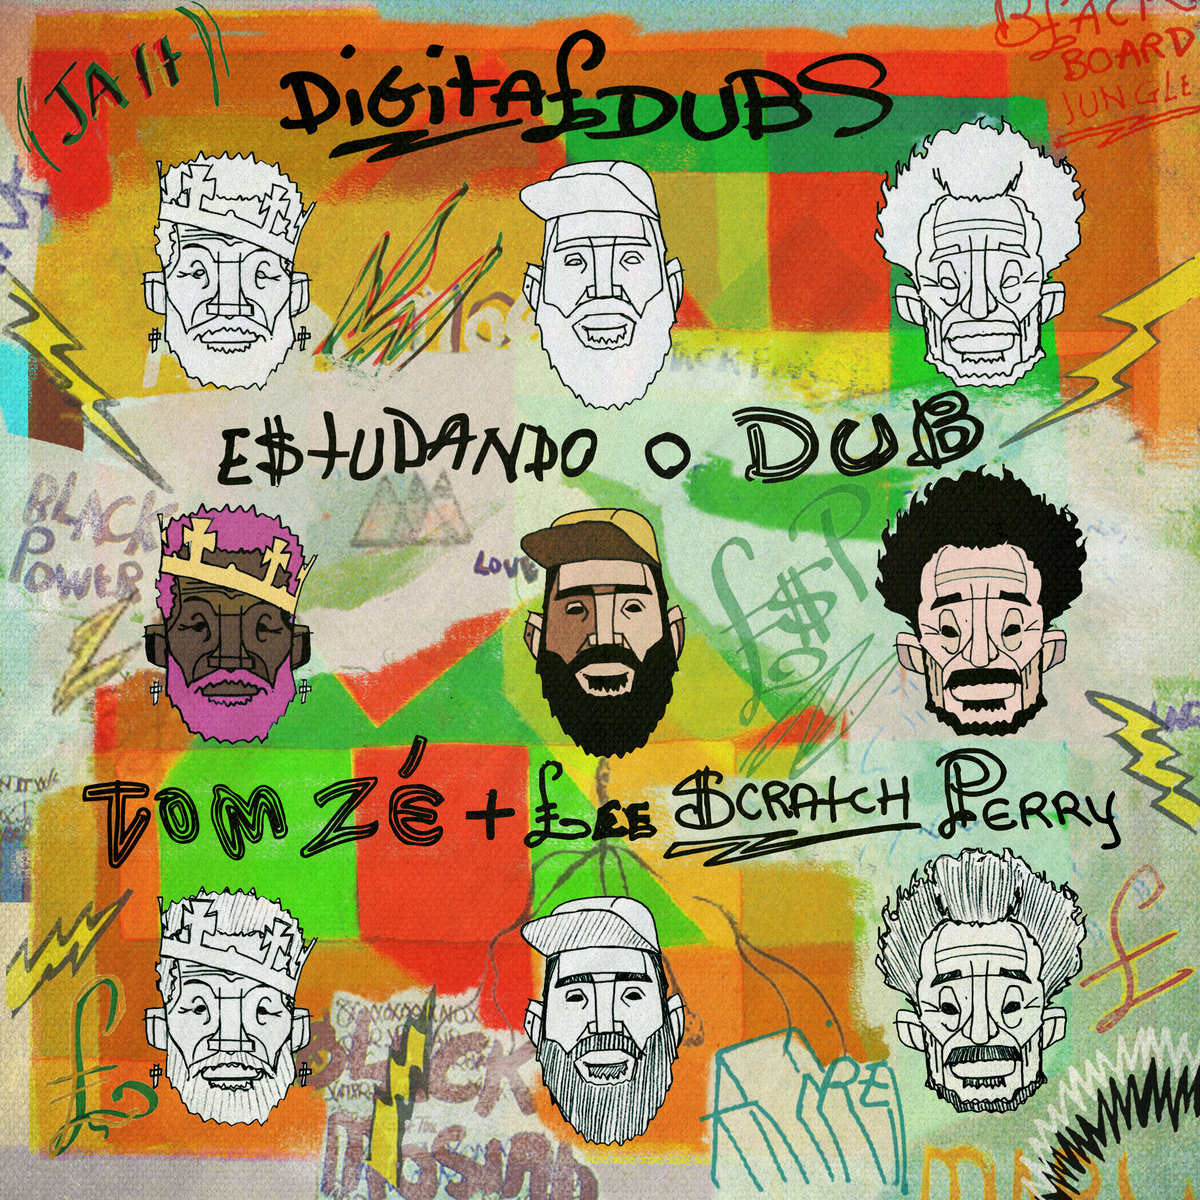 Estudando o Riddim (instrumental dub) | digitaldubs